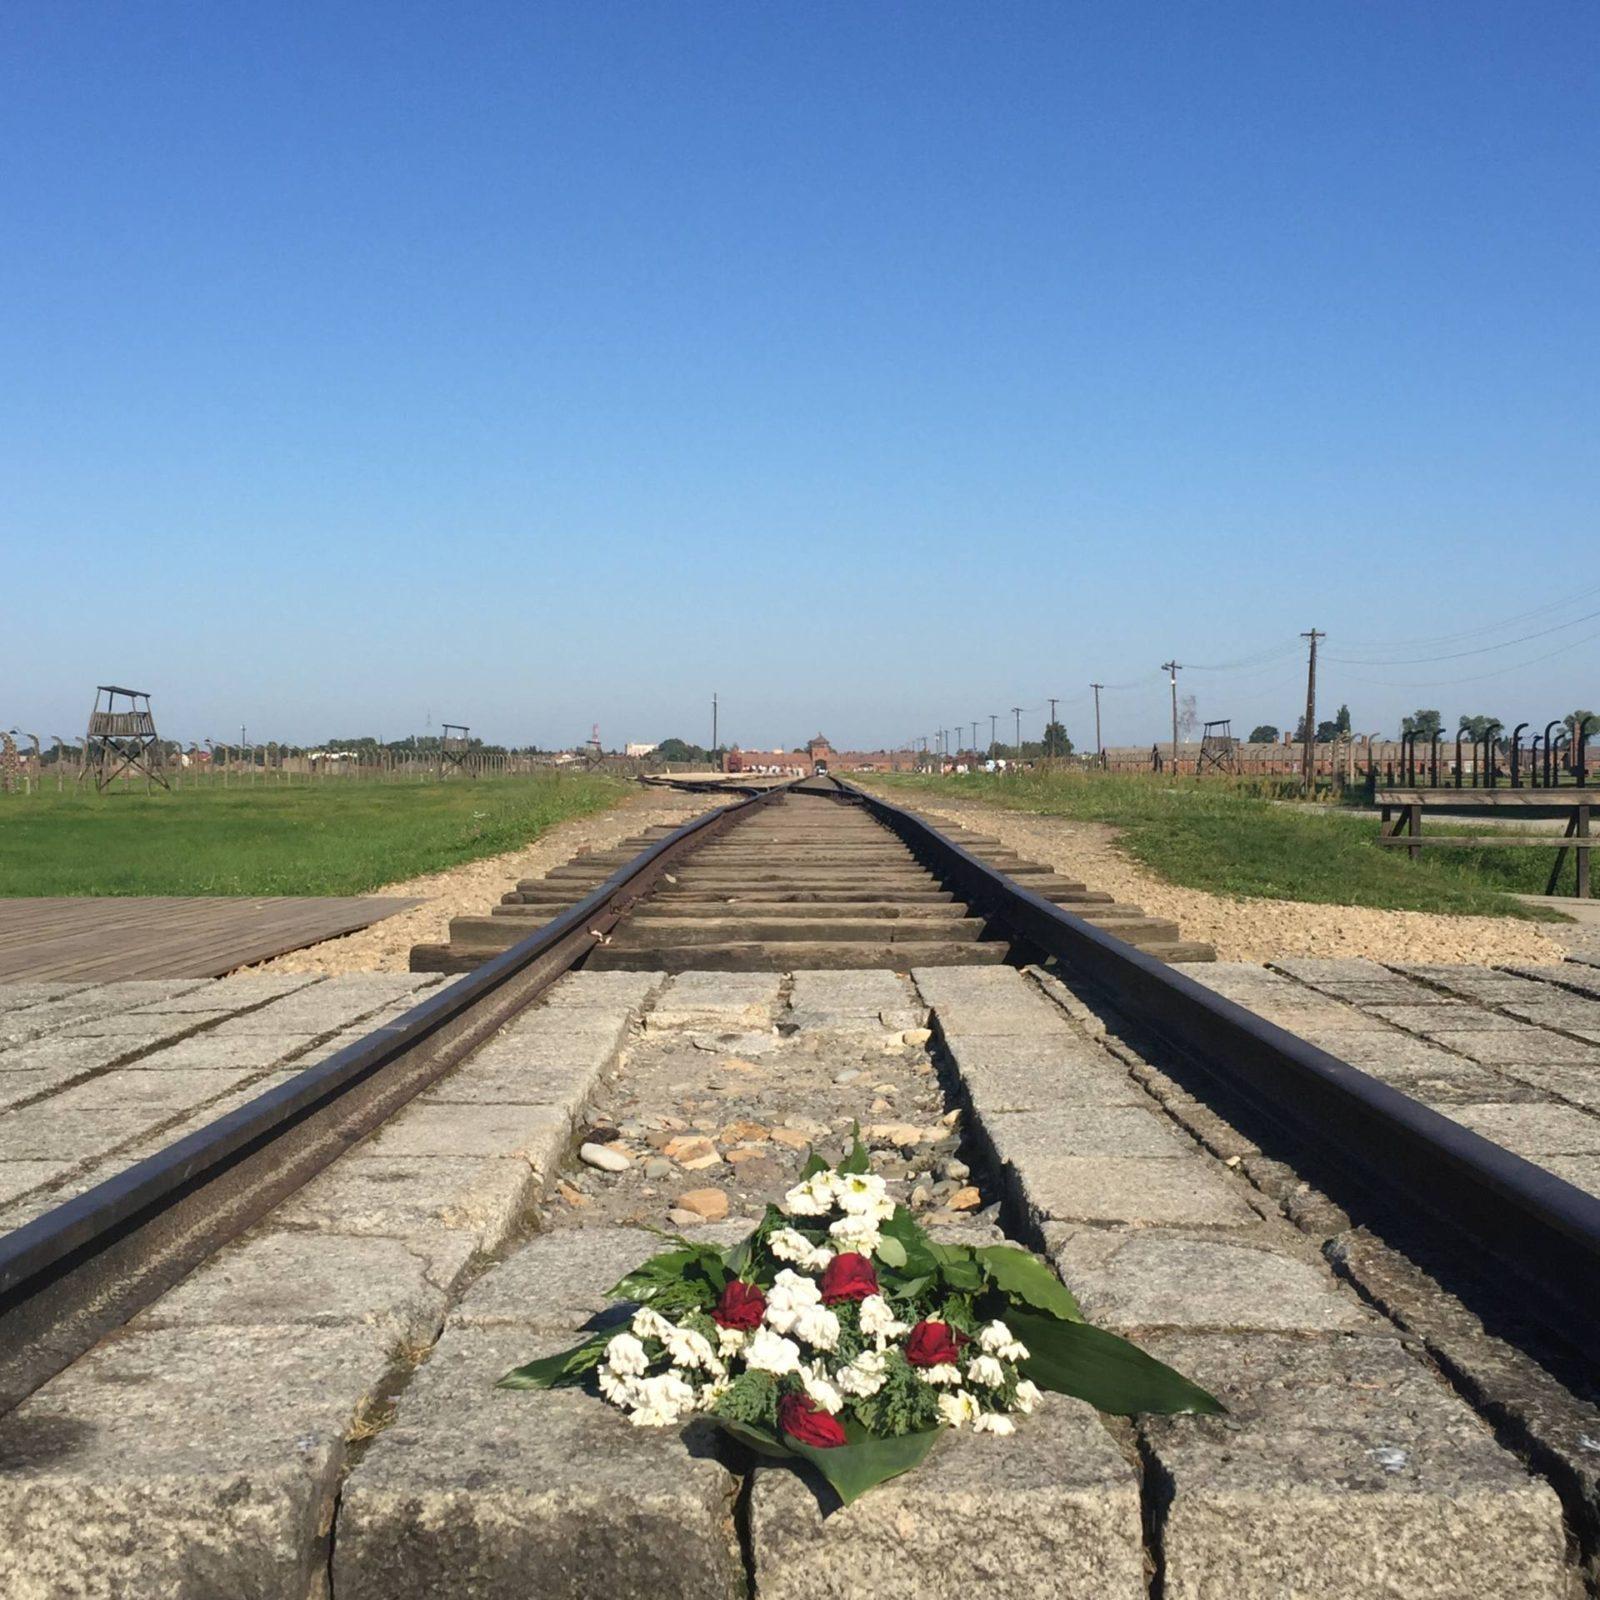 Emma Victoria Stokes Krakow Auschwitz Birkenau